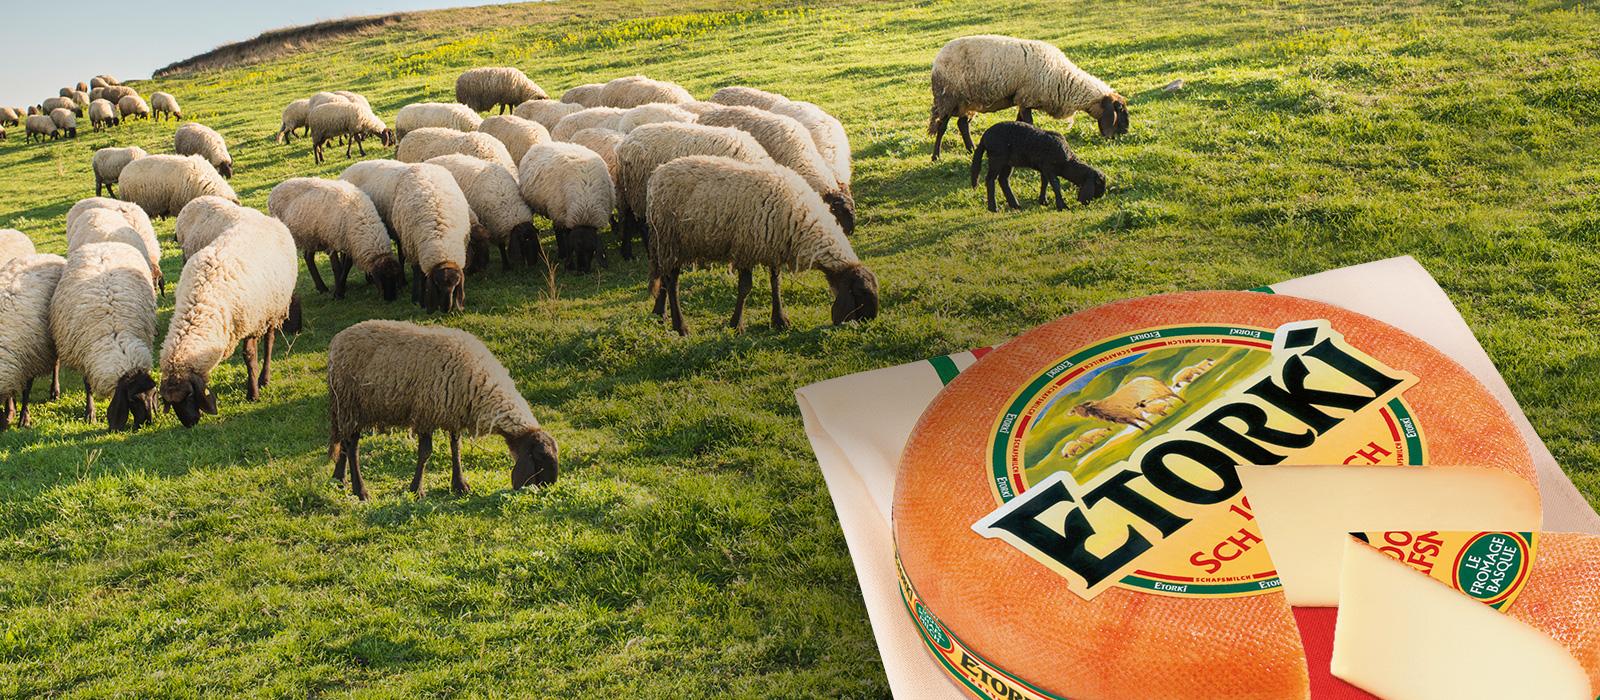 Etorki Marke Schafsherde Käselaib